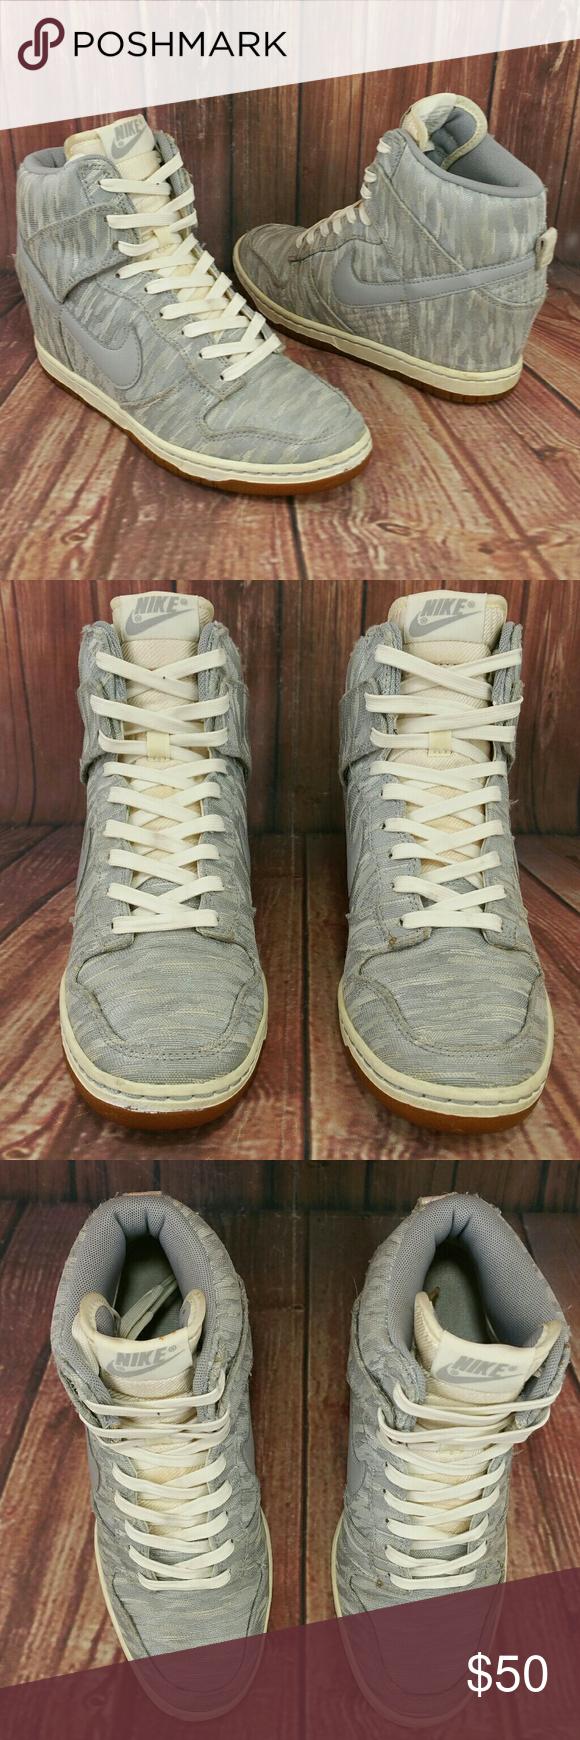 quality design 0976f 095f6 ... NIKE Dunk Sky Hi Premium Wedge Sail Silver Shoes 7 ...